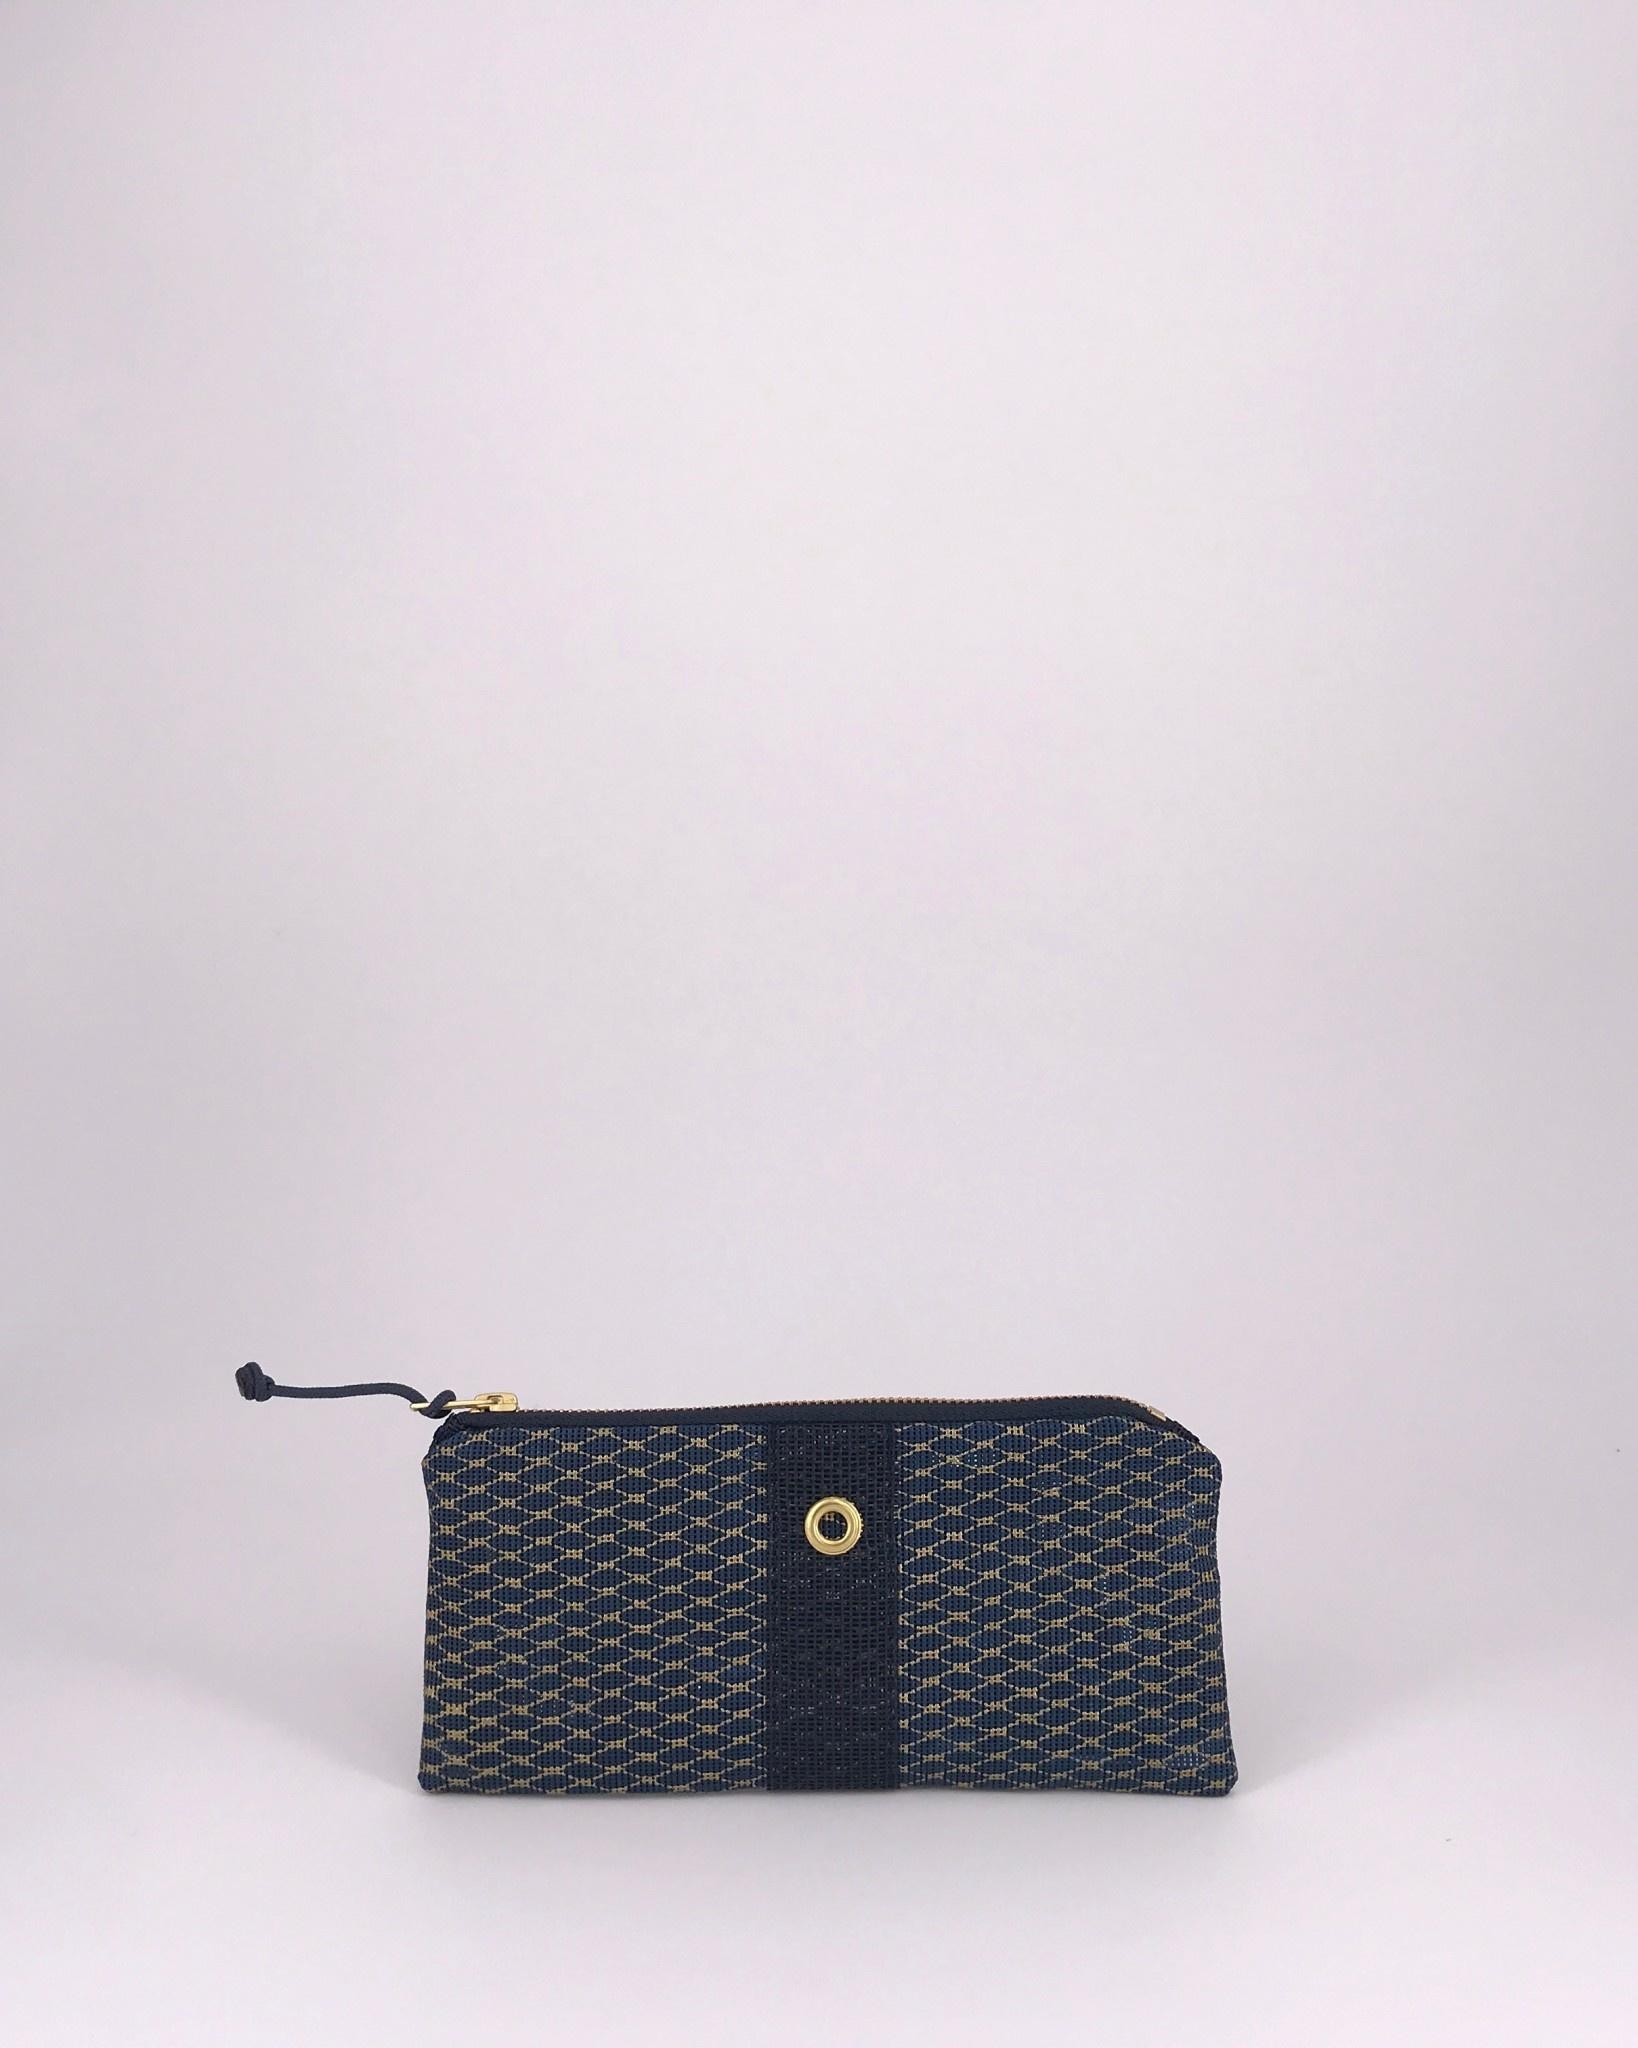 Alaina Marie ® Mini Gold Metallic on Navy & Navy Mini Clutch